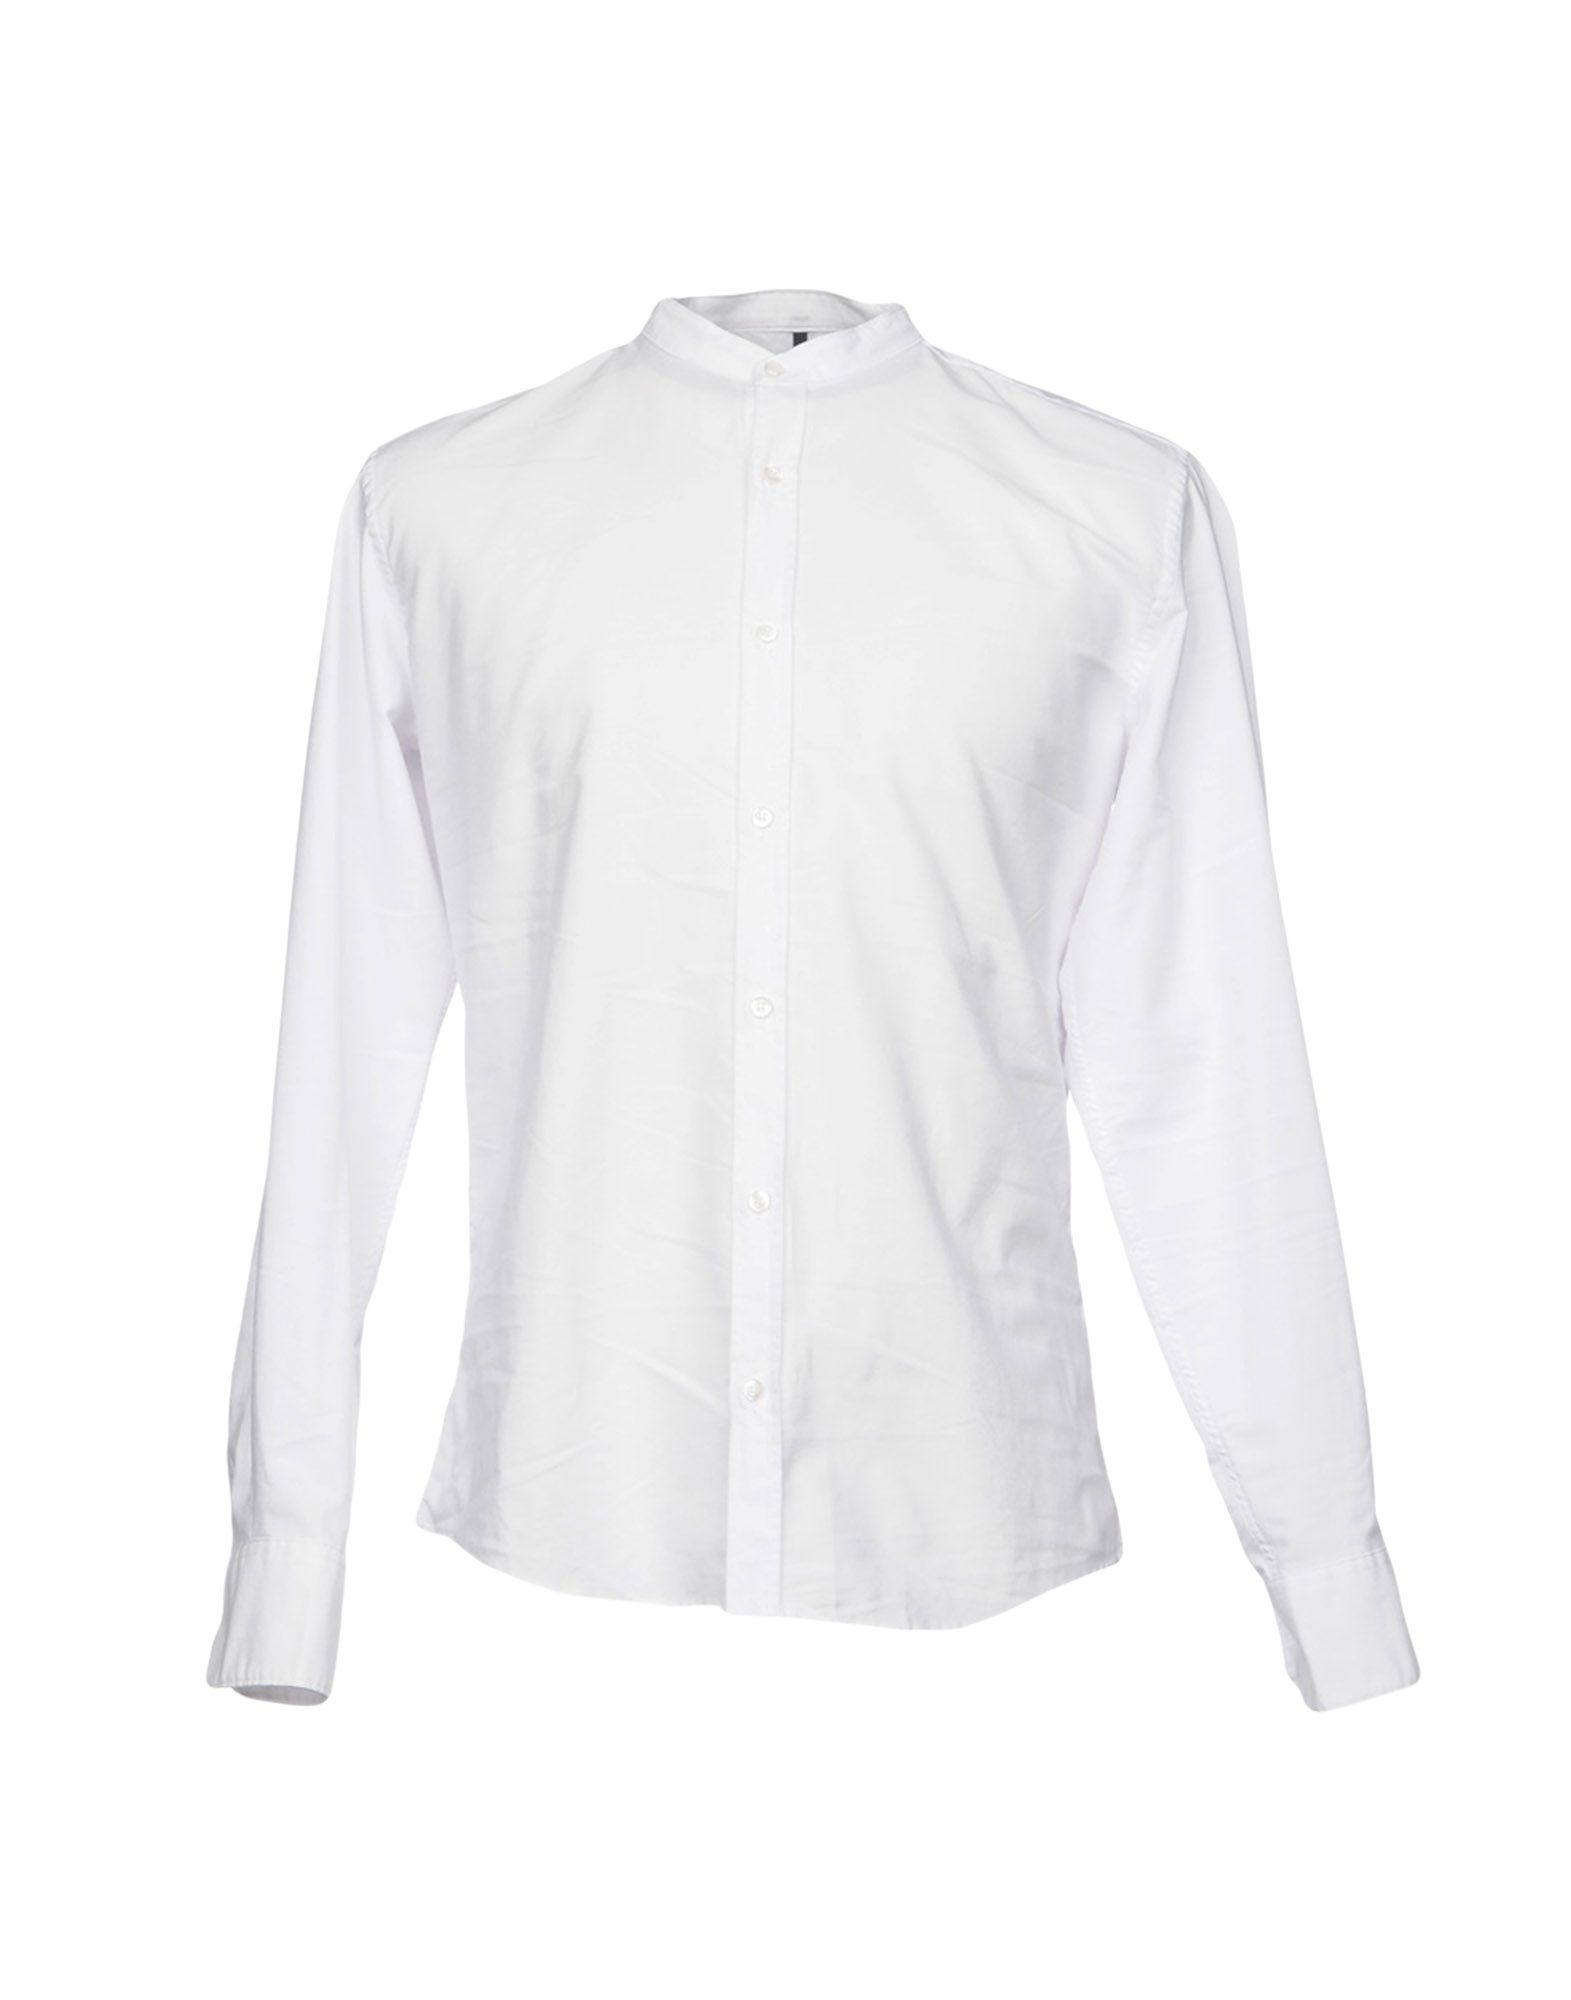 Camicia Tinta Uomo Unita 26.7 Twentysixseven Uomo Tinta - 38685351BQ debf6f